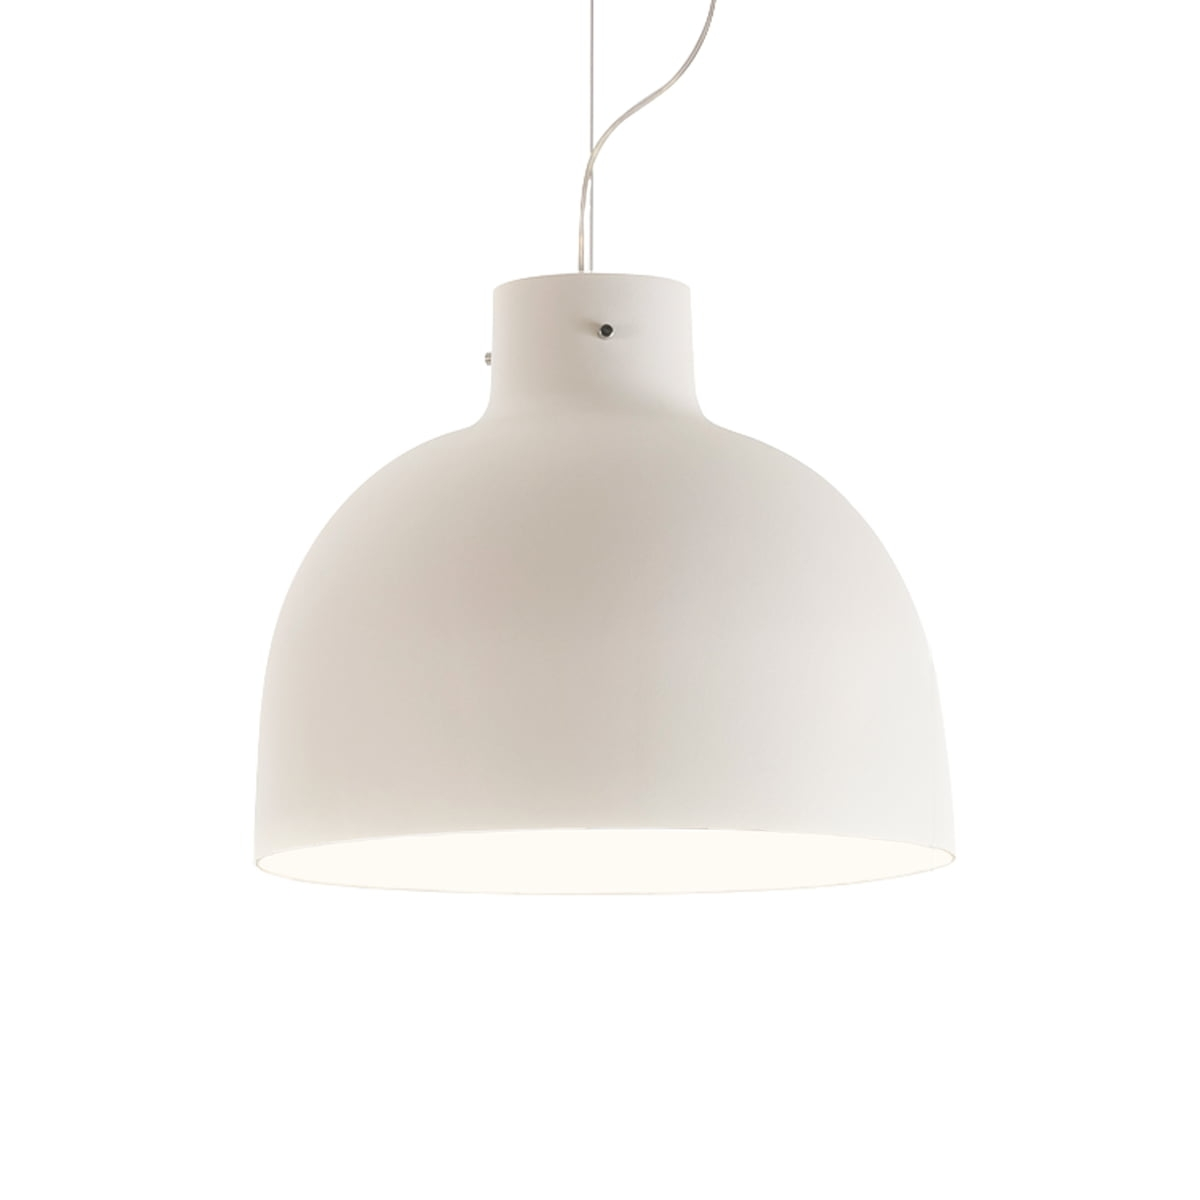 Suspensie Kartell Bellissima design Ferruccio Laviani LED 15W d50cm alb poza